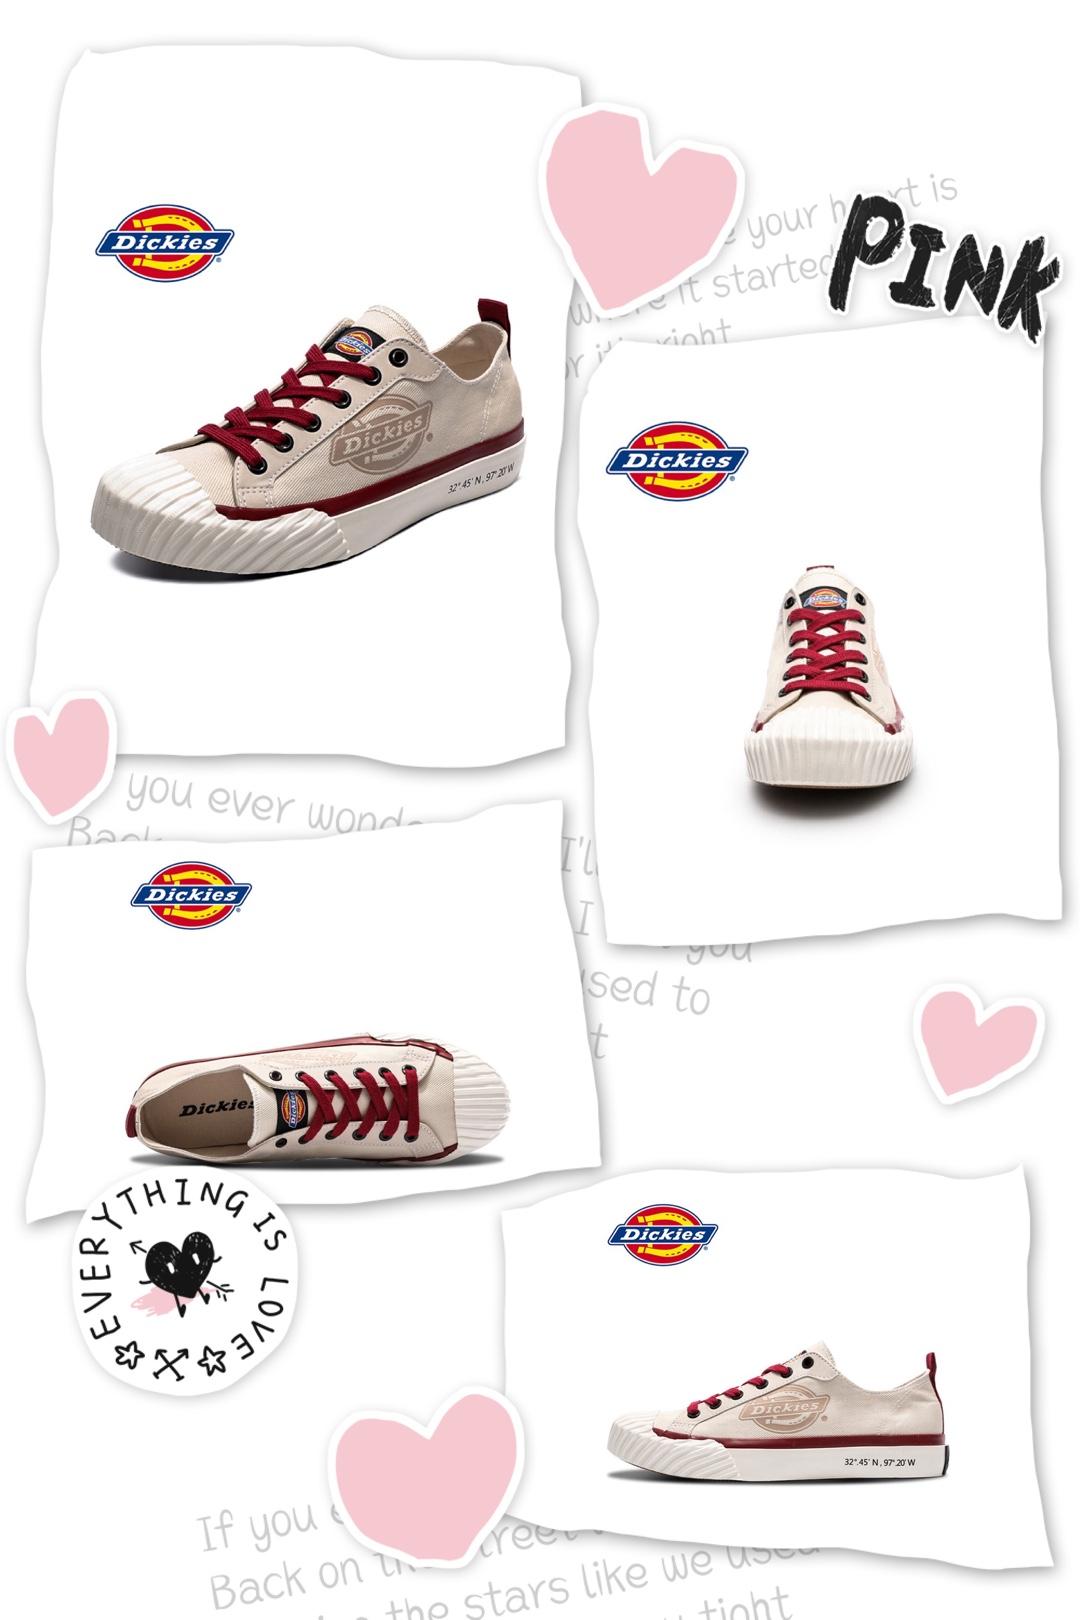 Dickies2019新款运动鞋简直美爆了! 🌈帆布鞋复古港味低帮帆布鞋 型号:191W50LXS15 超喜欢这款港味十足的帆布鞋,还特别的学院风,很有设计感,鞋头的设计也是今年最流行的 🌈学生款百搭红色低帮帆布鞋 型号:191W50LXS16 这款跟第一款是一样的款式,颜色不同,红色也非常好看 🌈透气款情侣帆布鞋 型号:191M50LXS24 这款帆布鞋跟匡威经典款大同小异,Dickies这款加了logo的设计显得与众不同 🌈情侣款高帮帆布鞋 型号:193M50LXS25 高帮款也是非常时髦的,黑白两色各有千秋 🌈红色经典款高帮帆布鞋 型号:191W50LXS01 这款红色设计可以说很用心了,细节感很强,穿出去绝对不会撞款